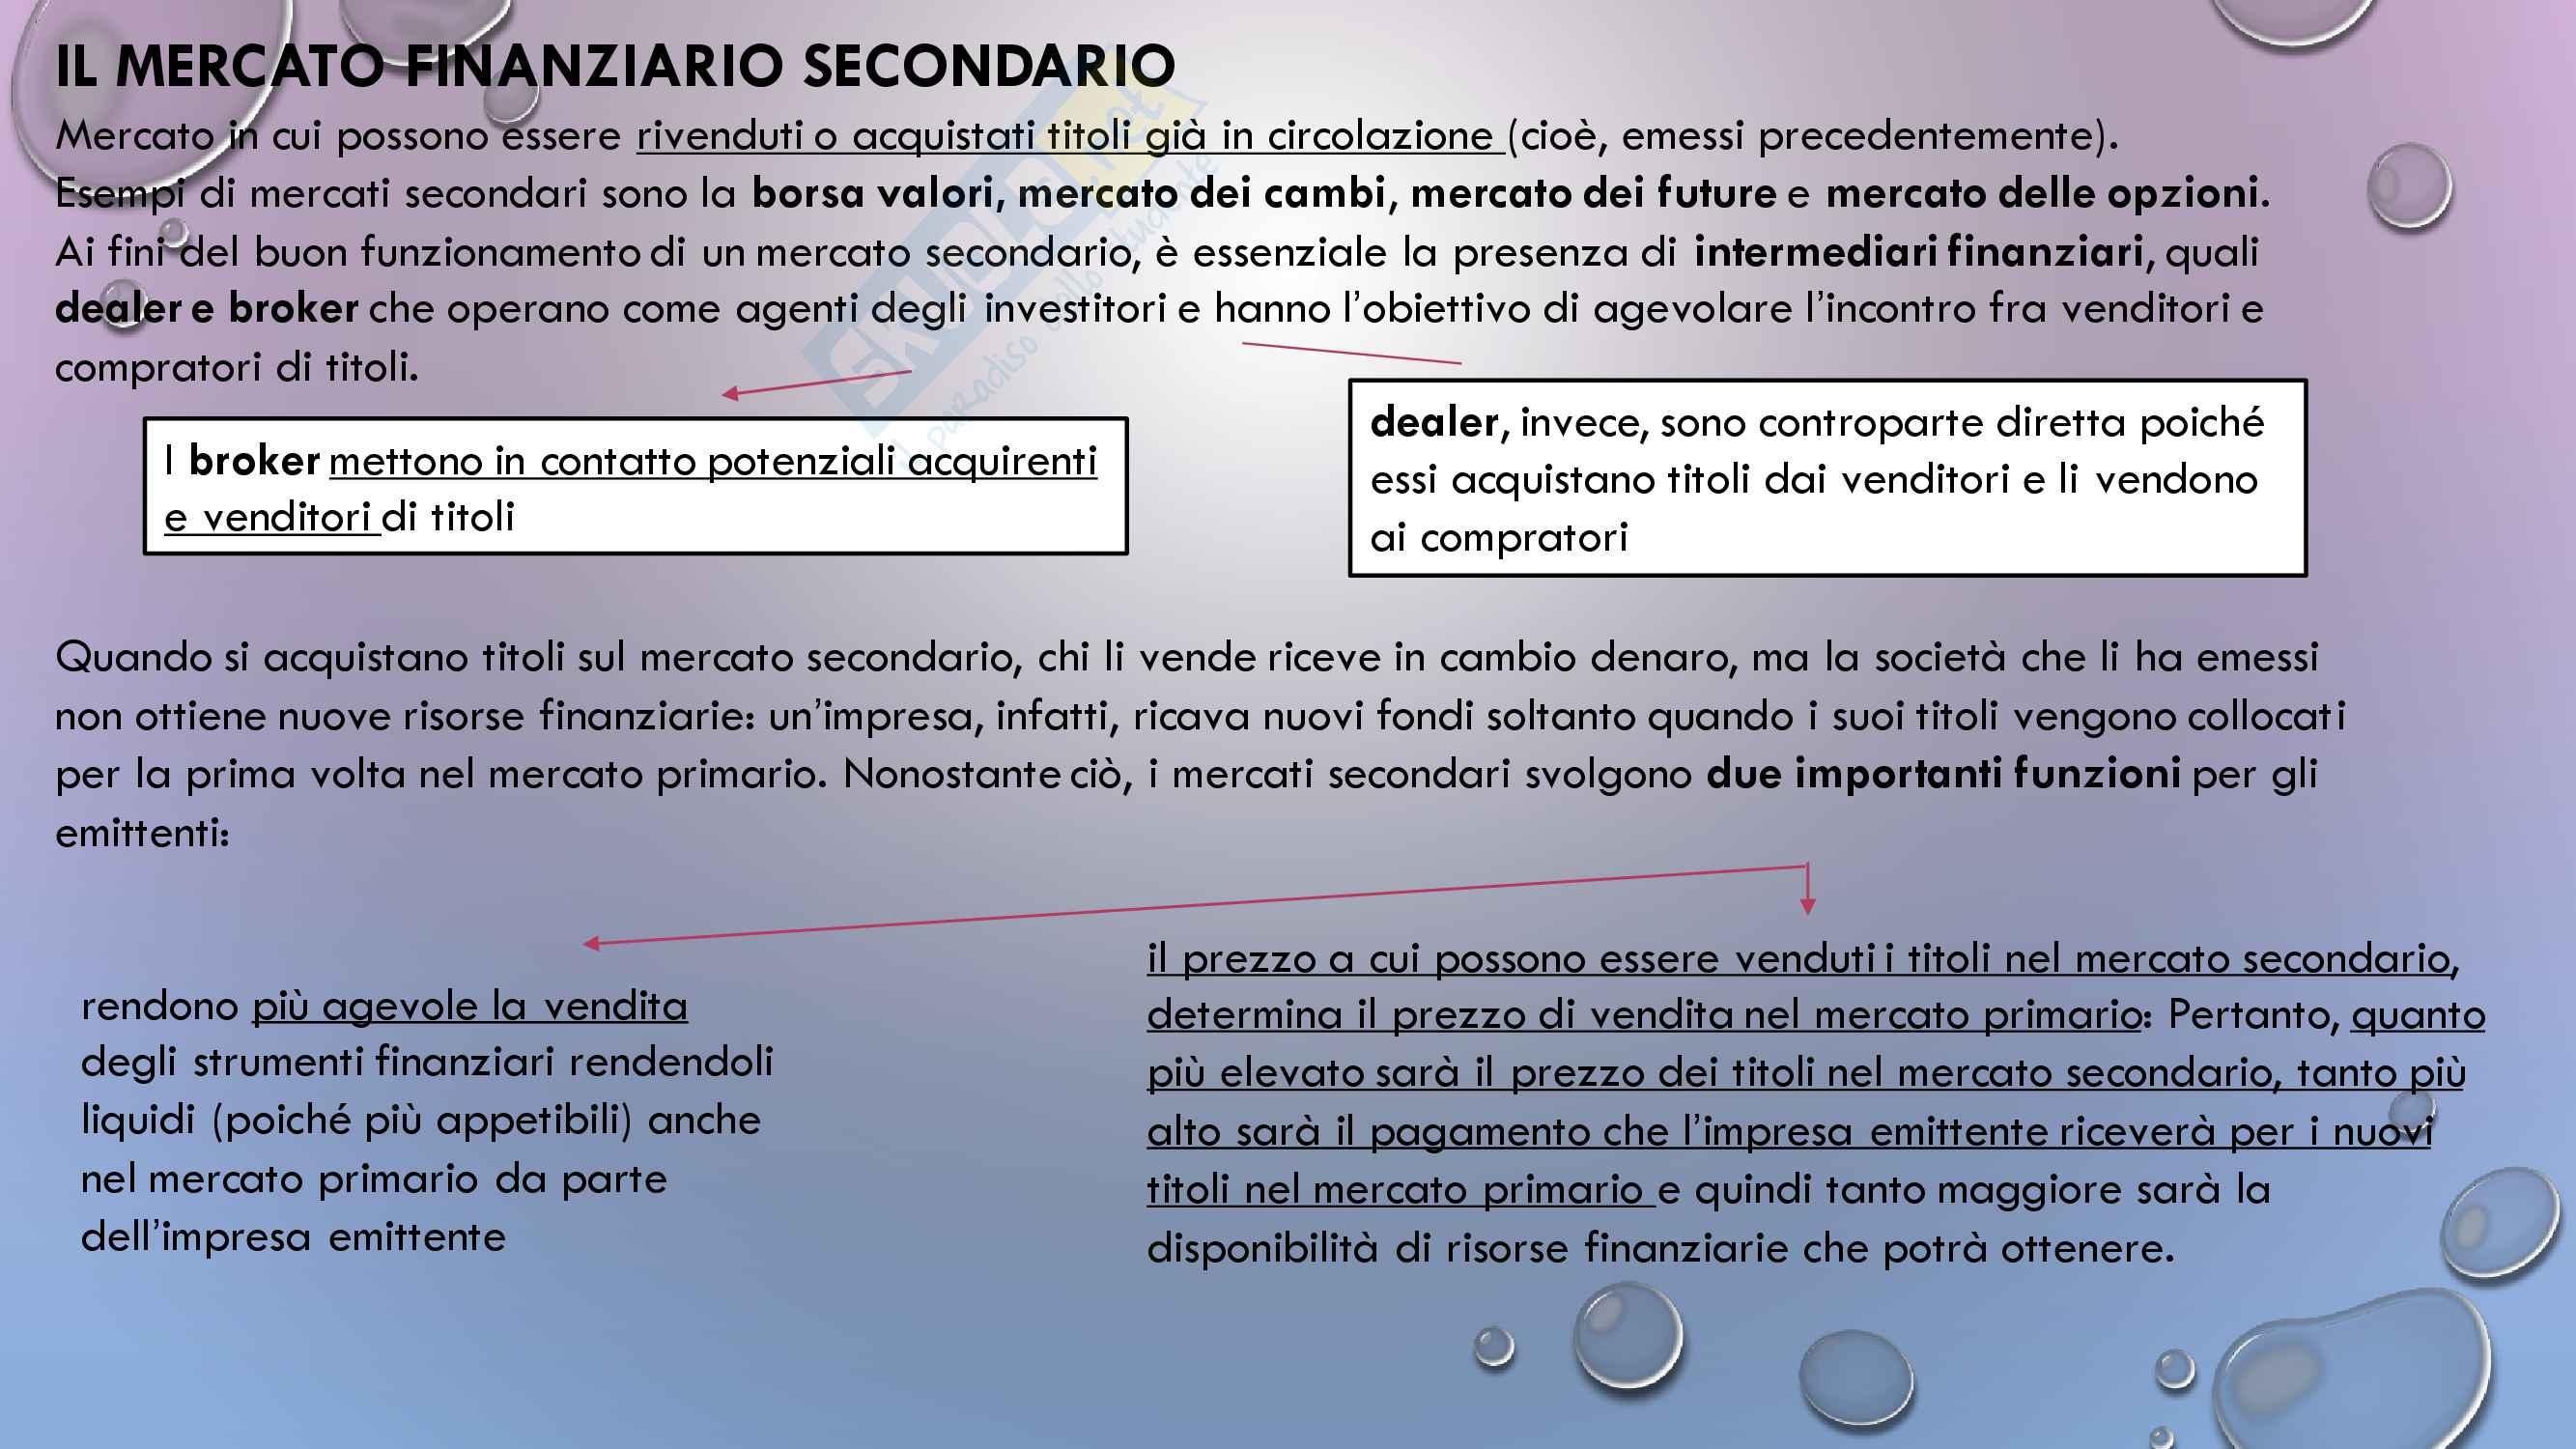 Appunti esame Intermediari finanziari, Prof De Sury Pag. 2